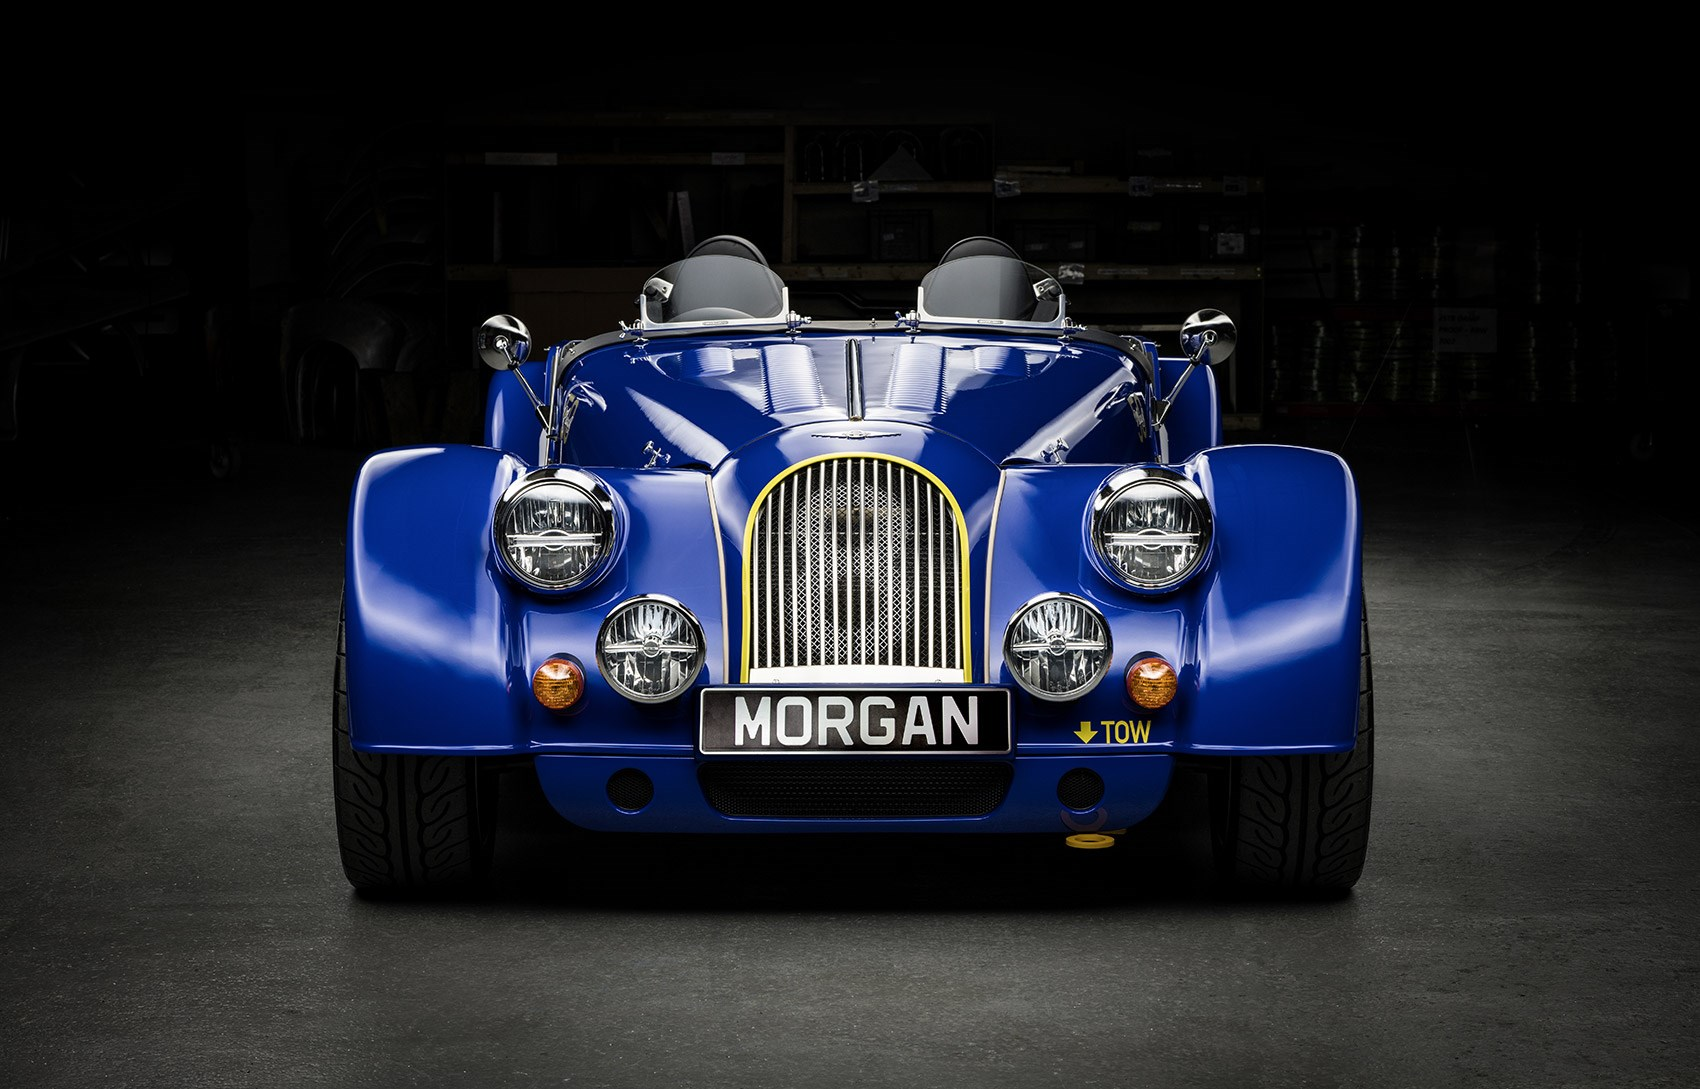 Morgan Aero Gt 2018 >> Morgan Aero GT and Plus 8 50th Anniversary specs prices pictures | CAR Magazine